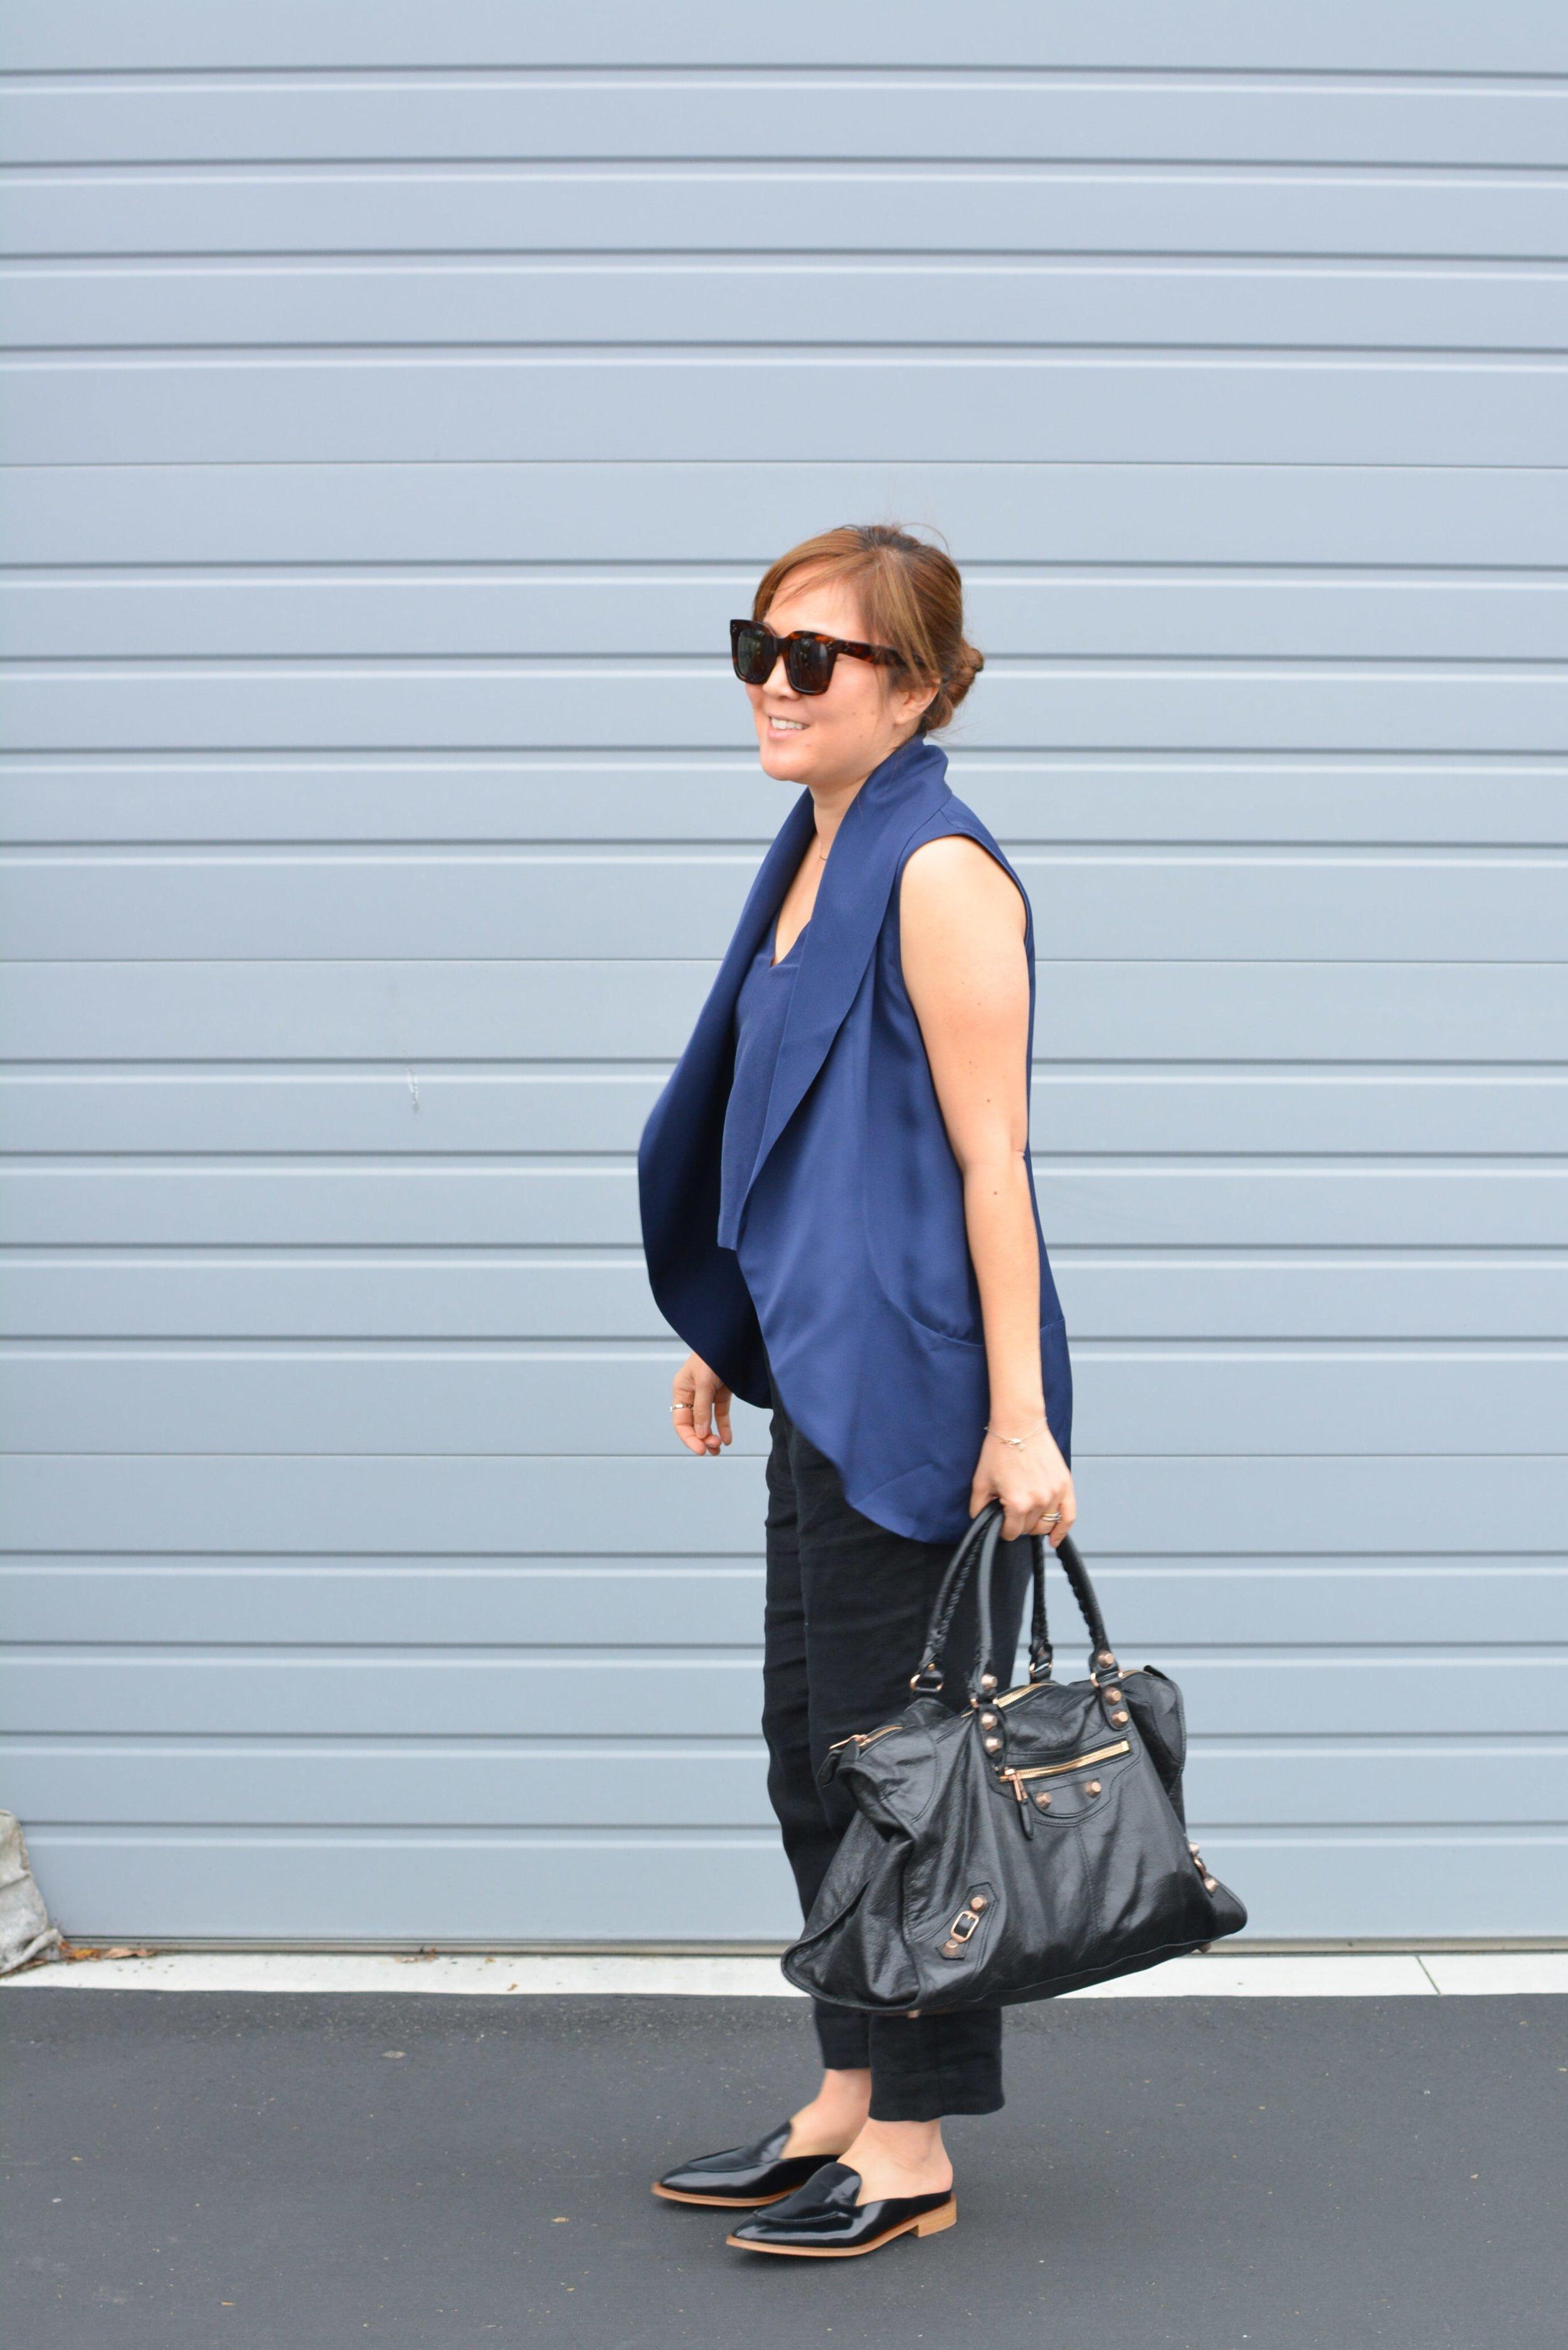 Balenciaga Work Bag from Fashionphile